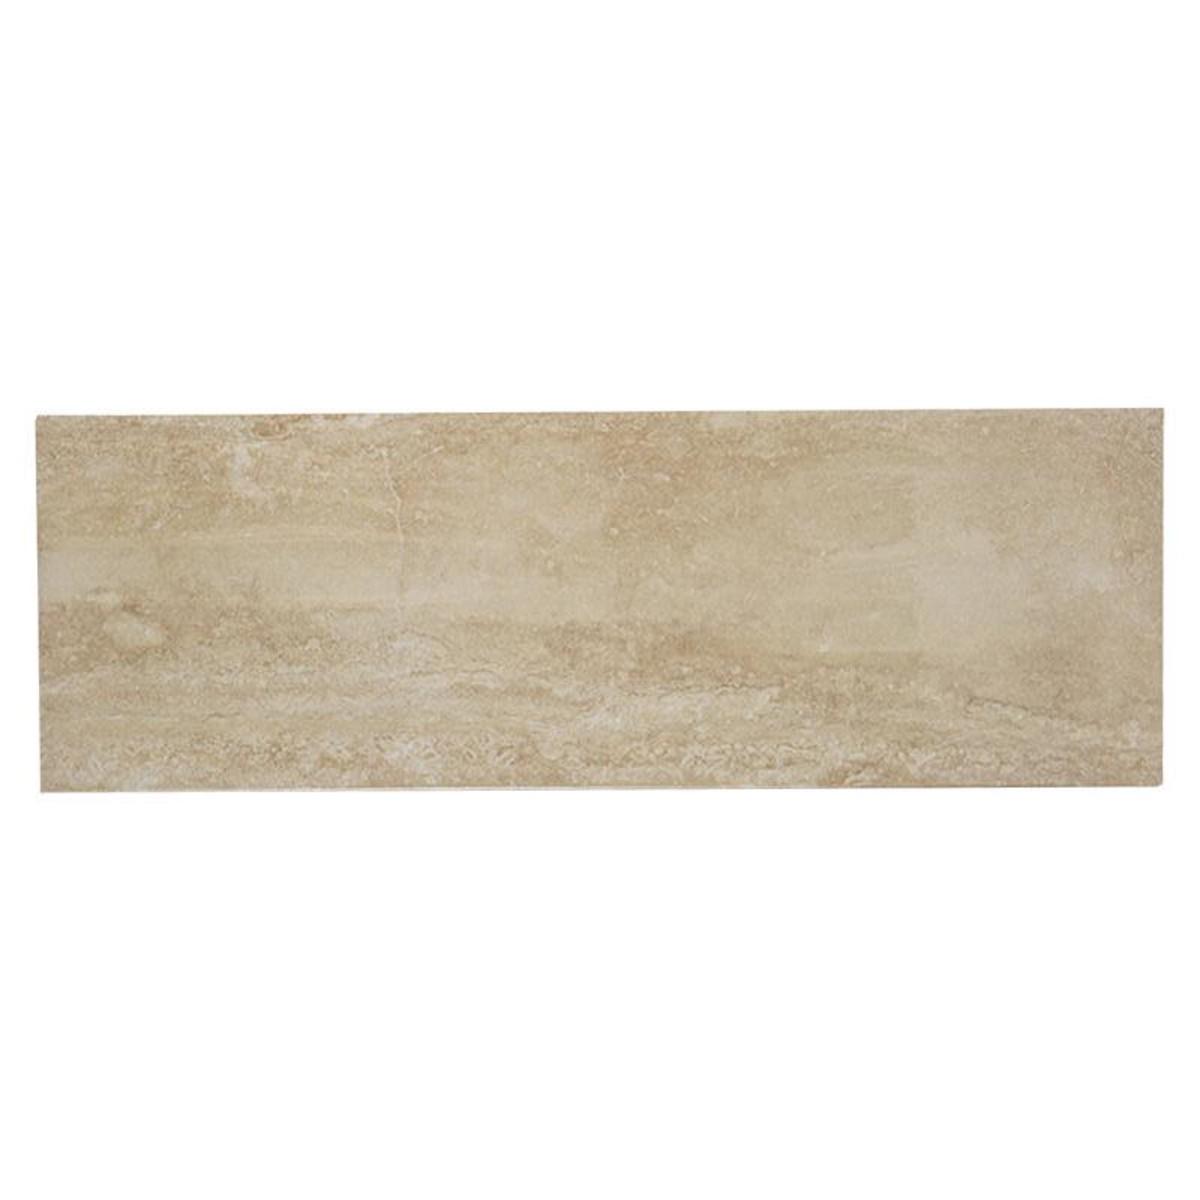 Плитка настенная Travertine Duna 25х75 см 1.31 м2 цвет бежевый